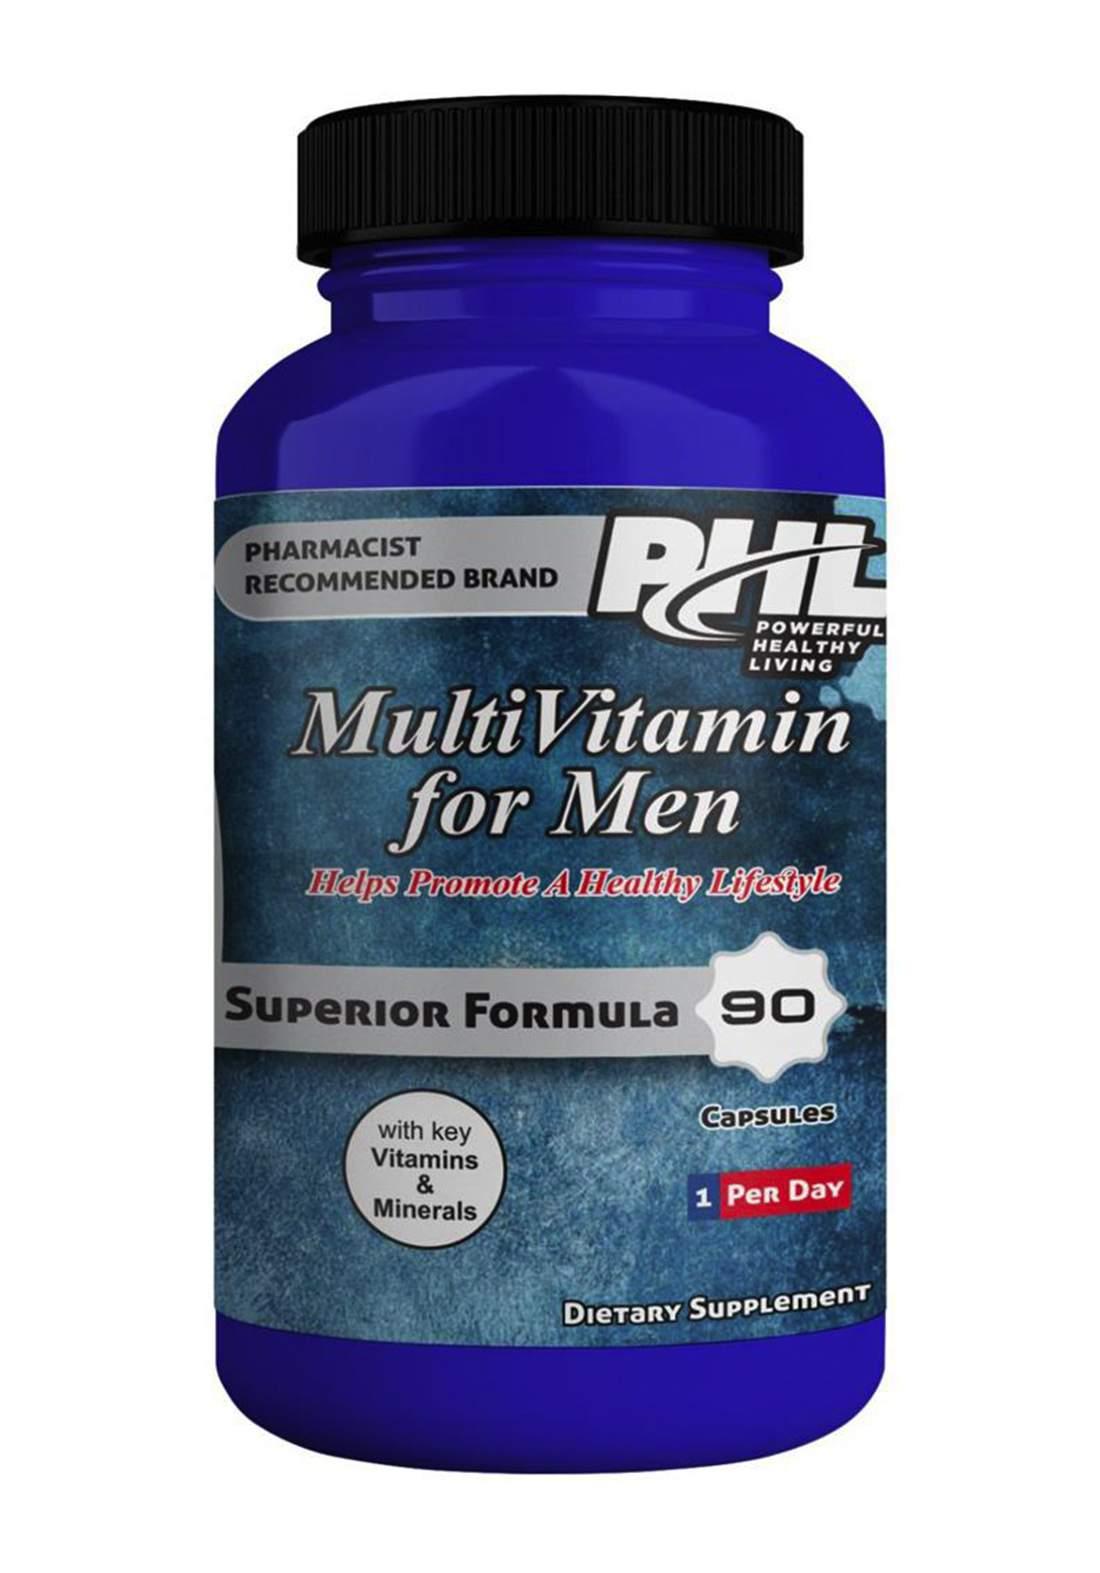 PHL Multivitamin for men 90 capsules فيتامينات متعددة  للرجال